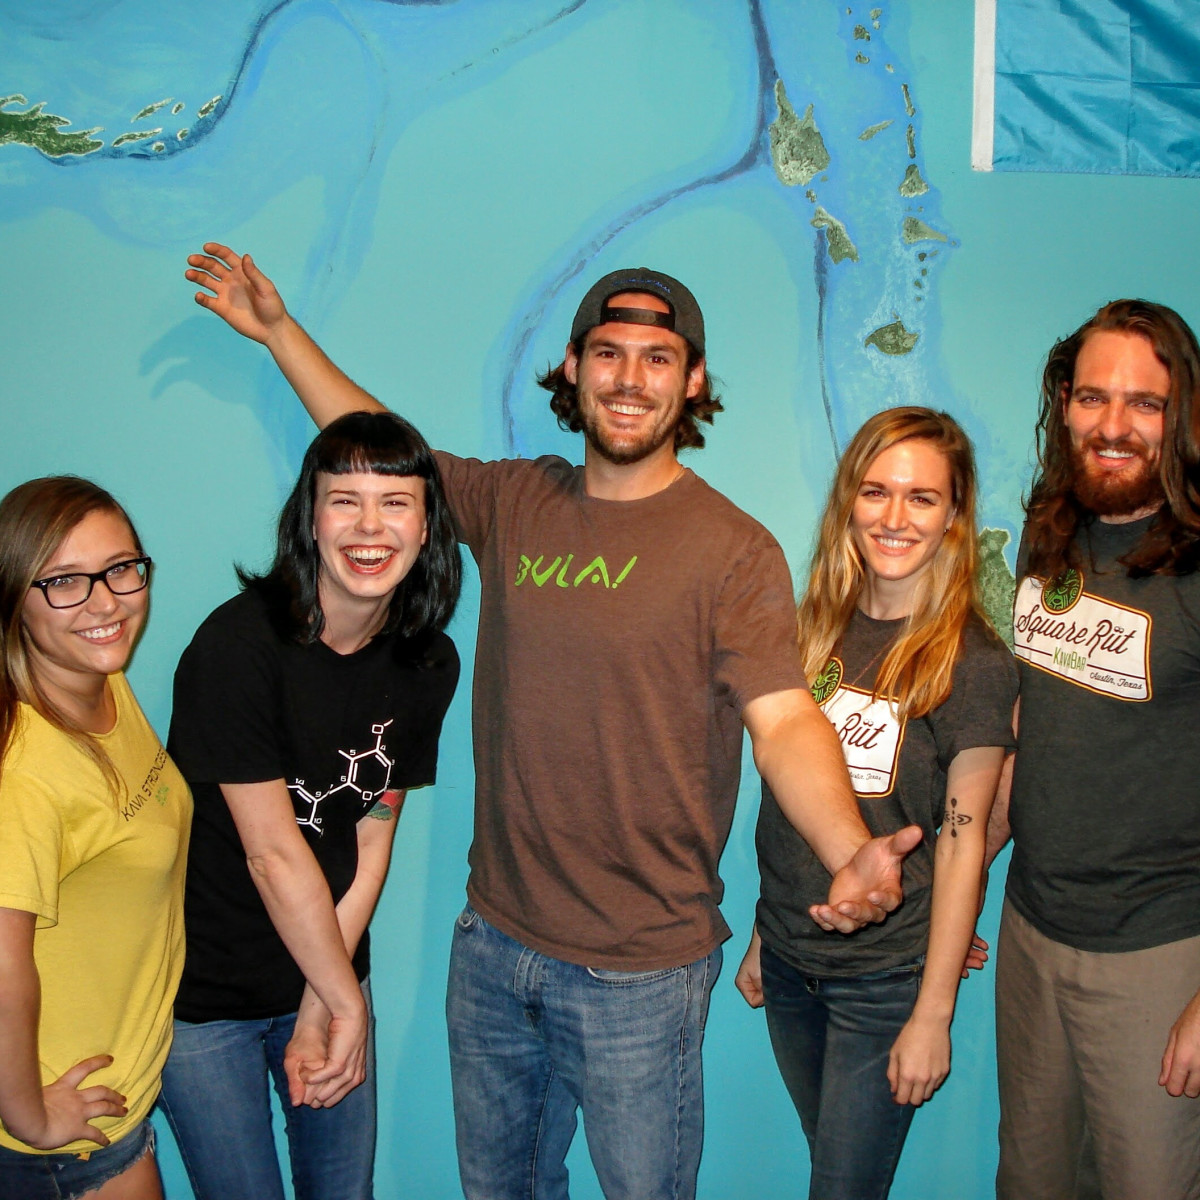 SquareRut Kava Bar team